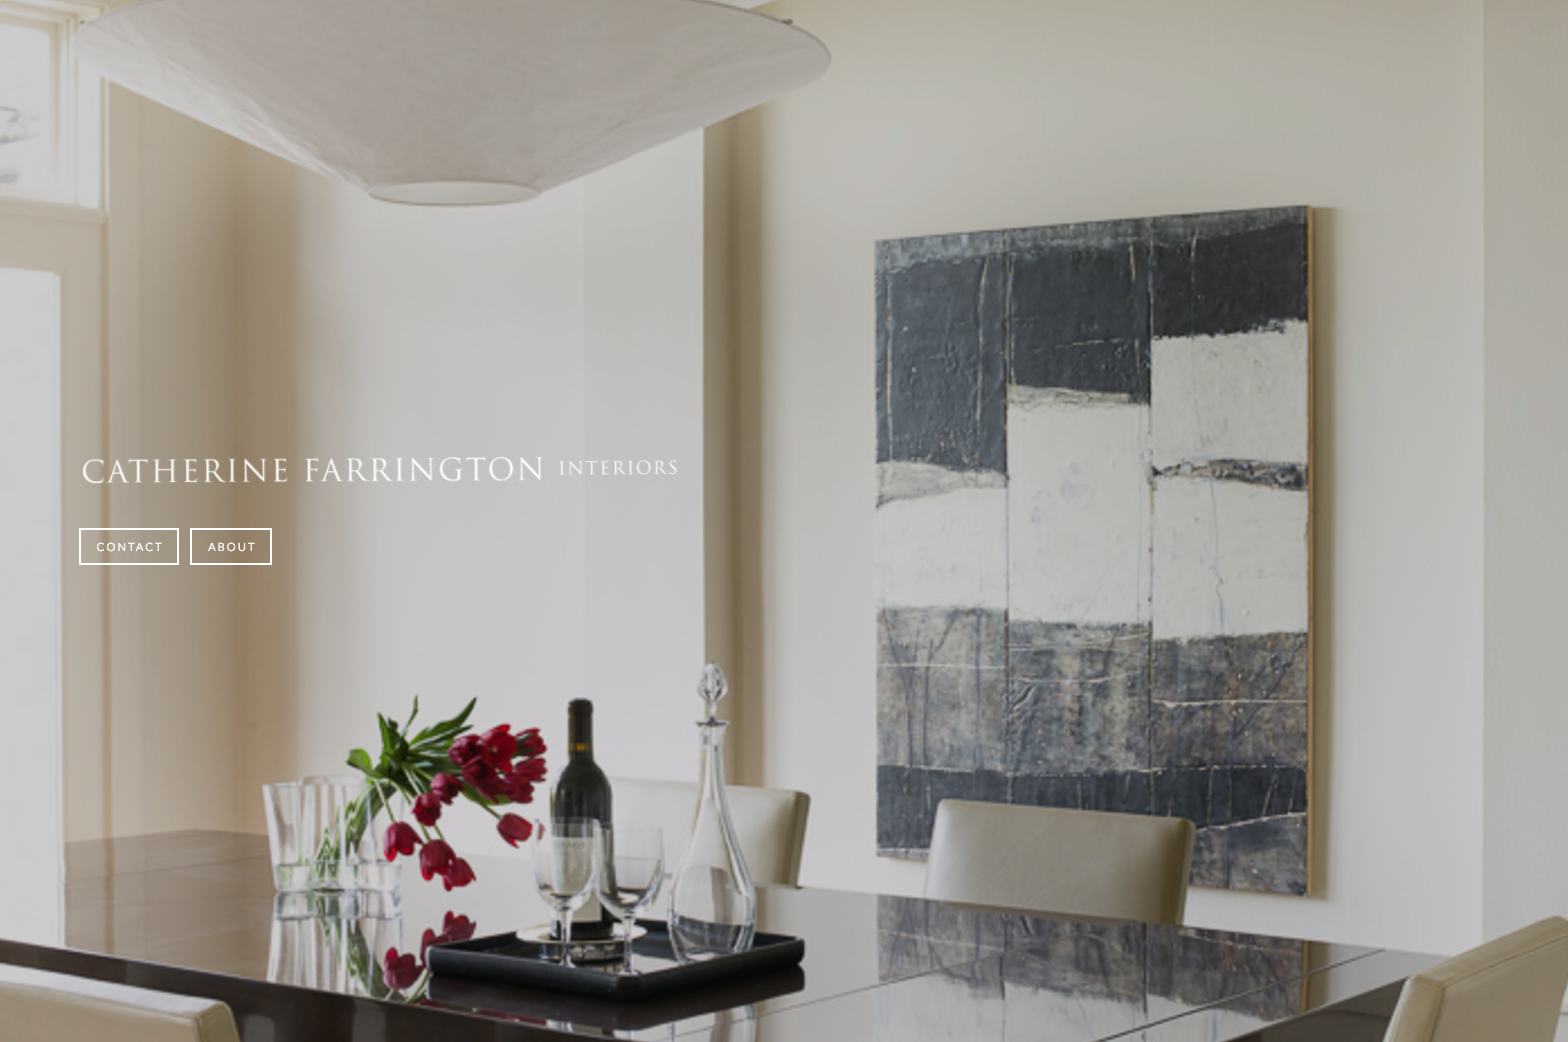 cathe-farrington-lr copy.png